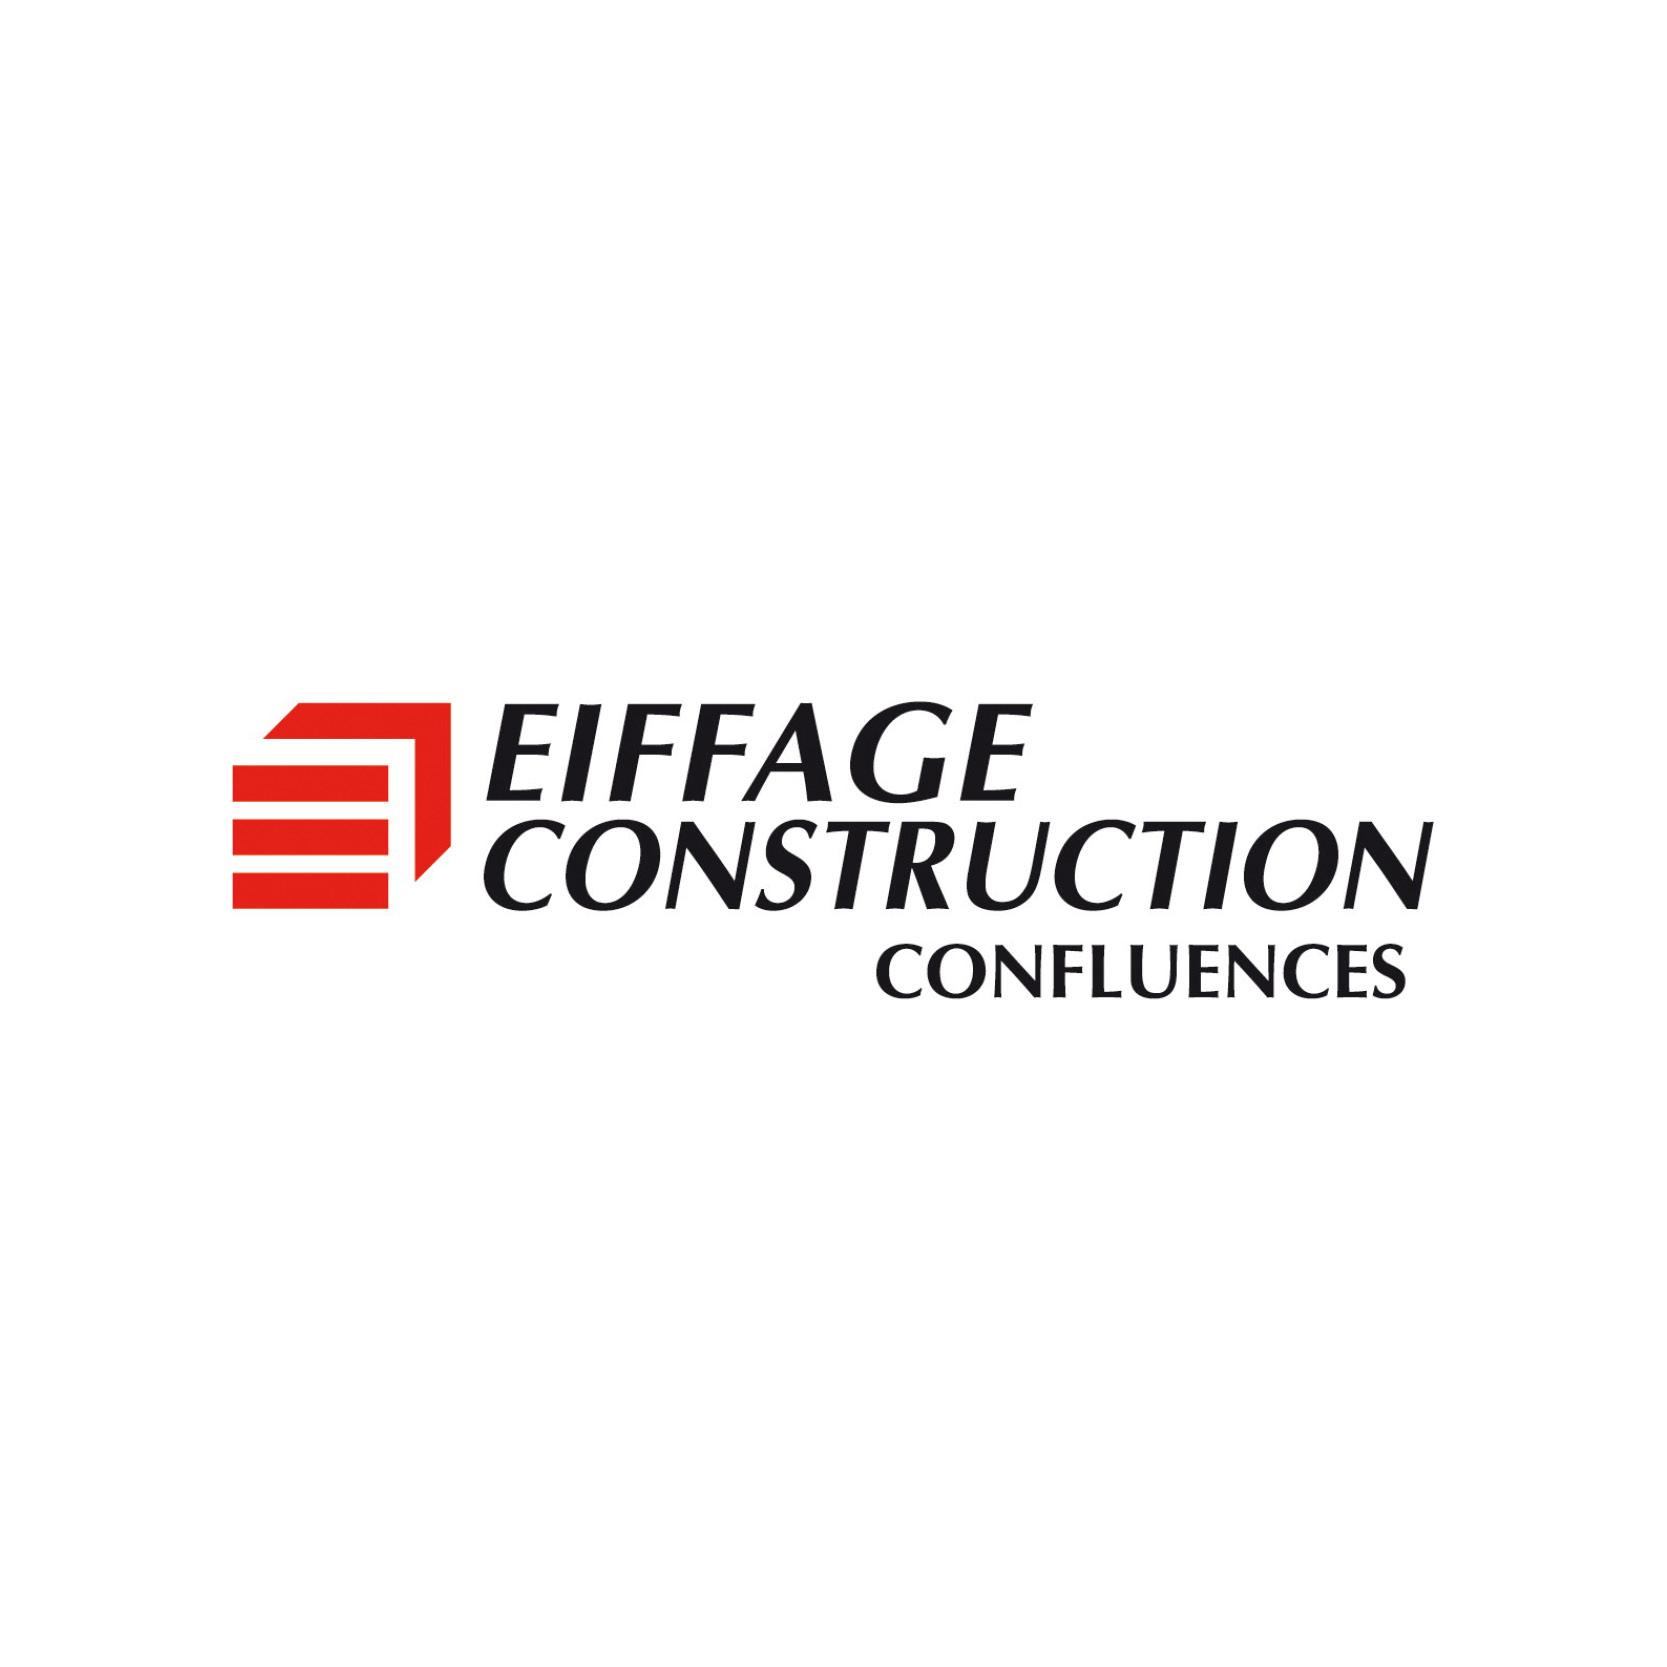 Eiffage Construction Confluence